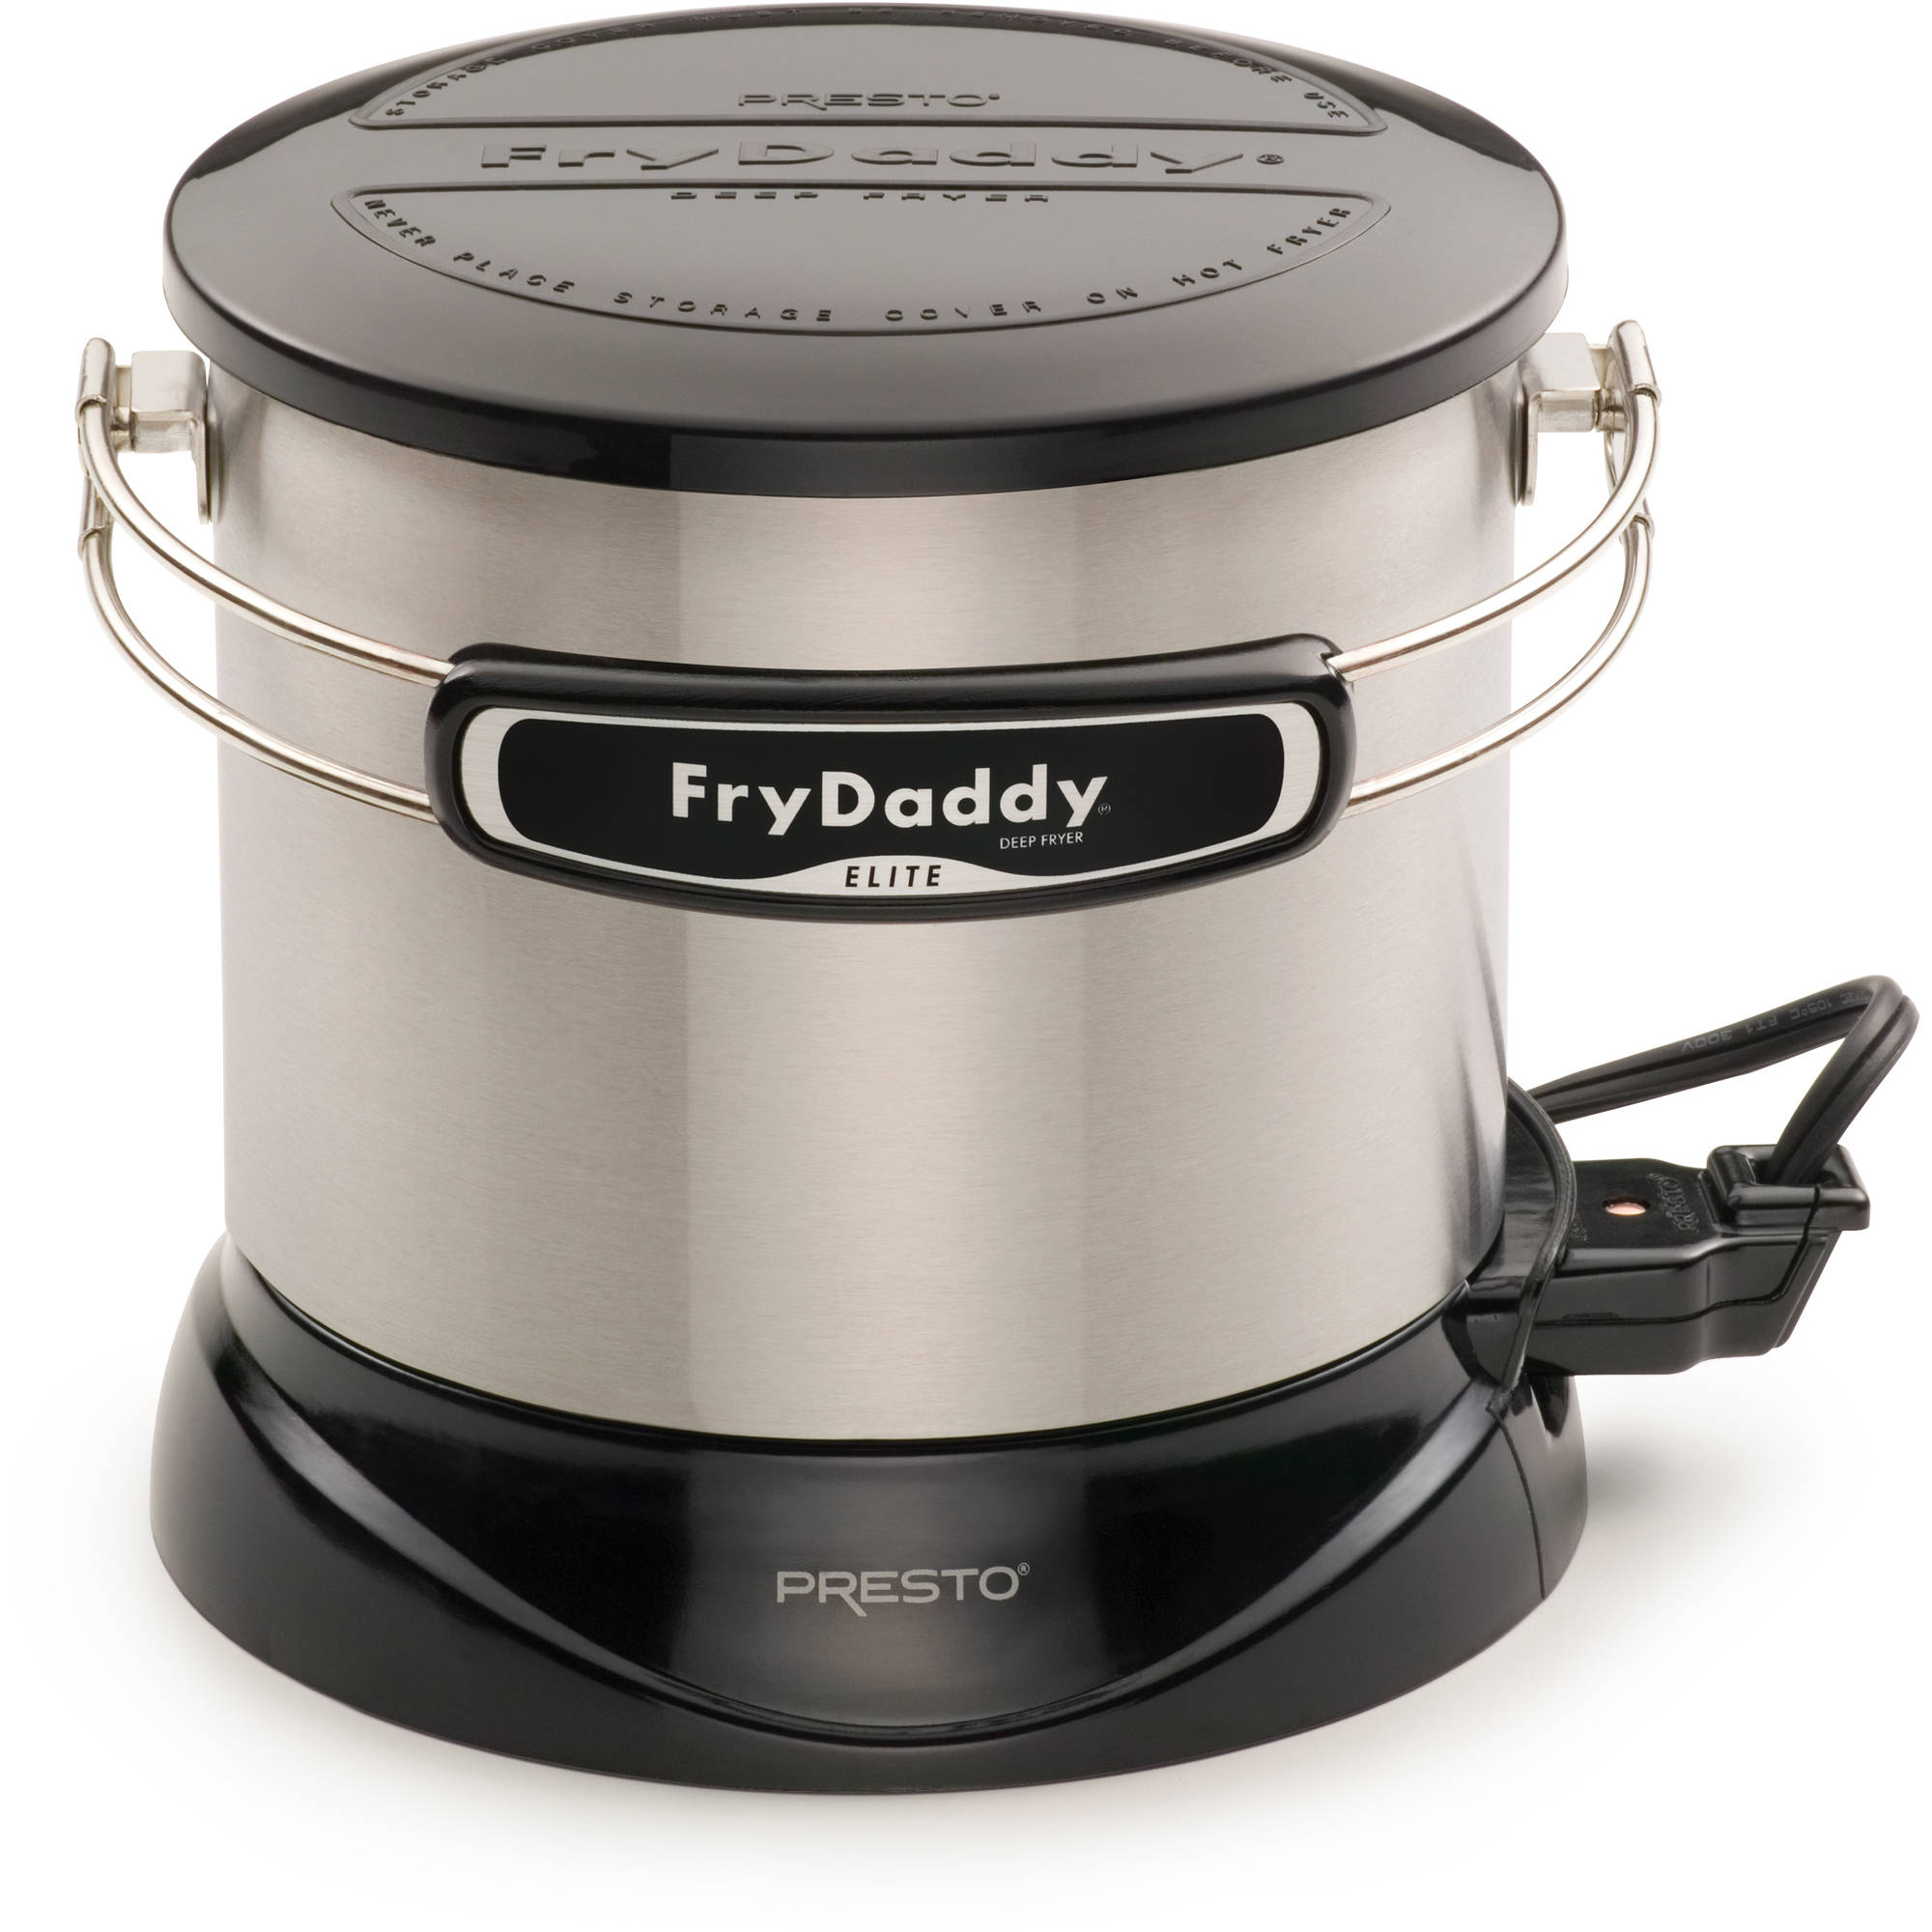 presto frydaddy elite 4-cup electric deep fryer - walmart